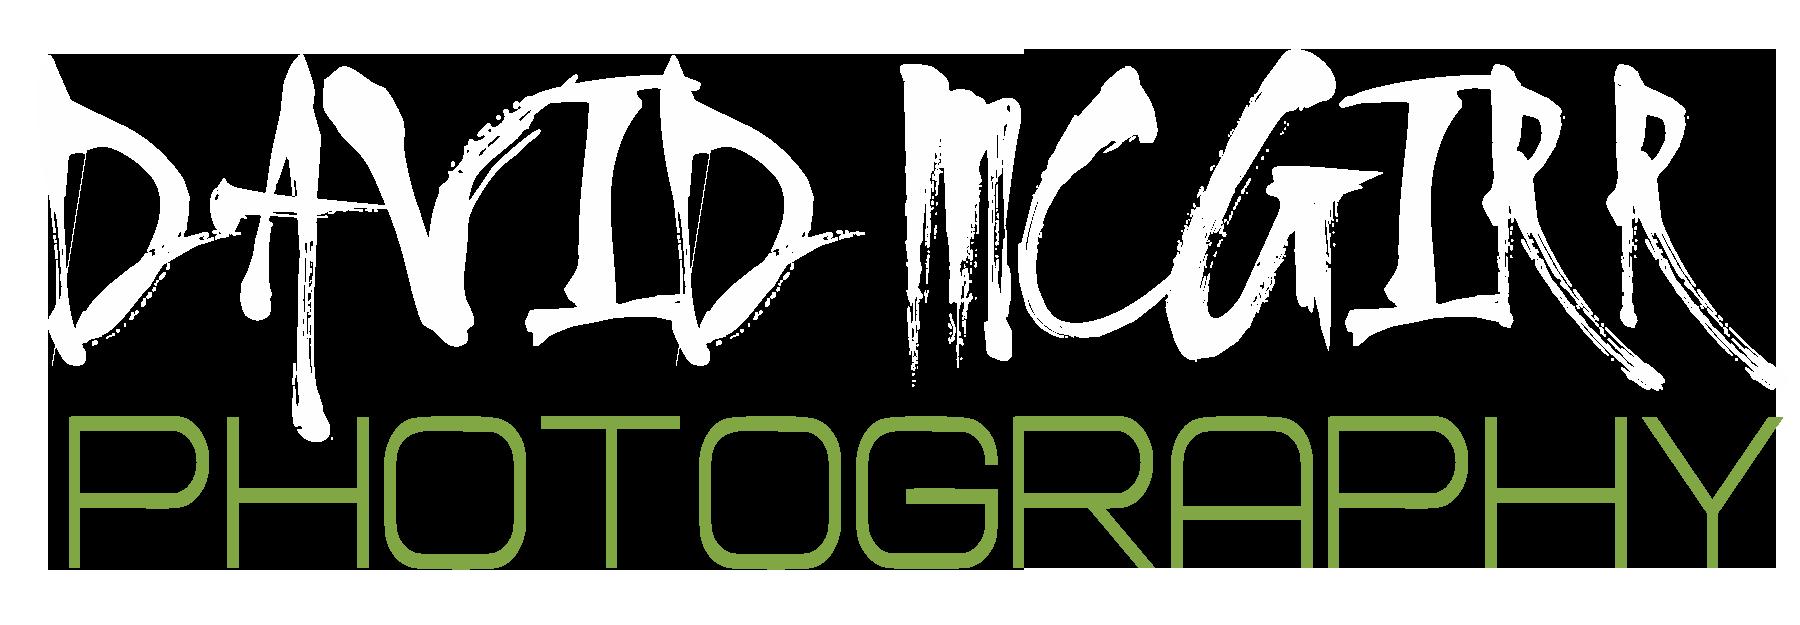 David McGirr Photography